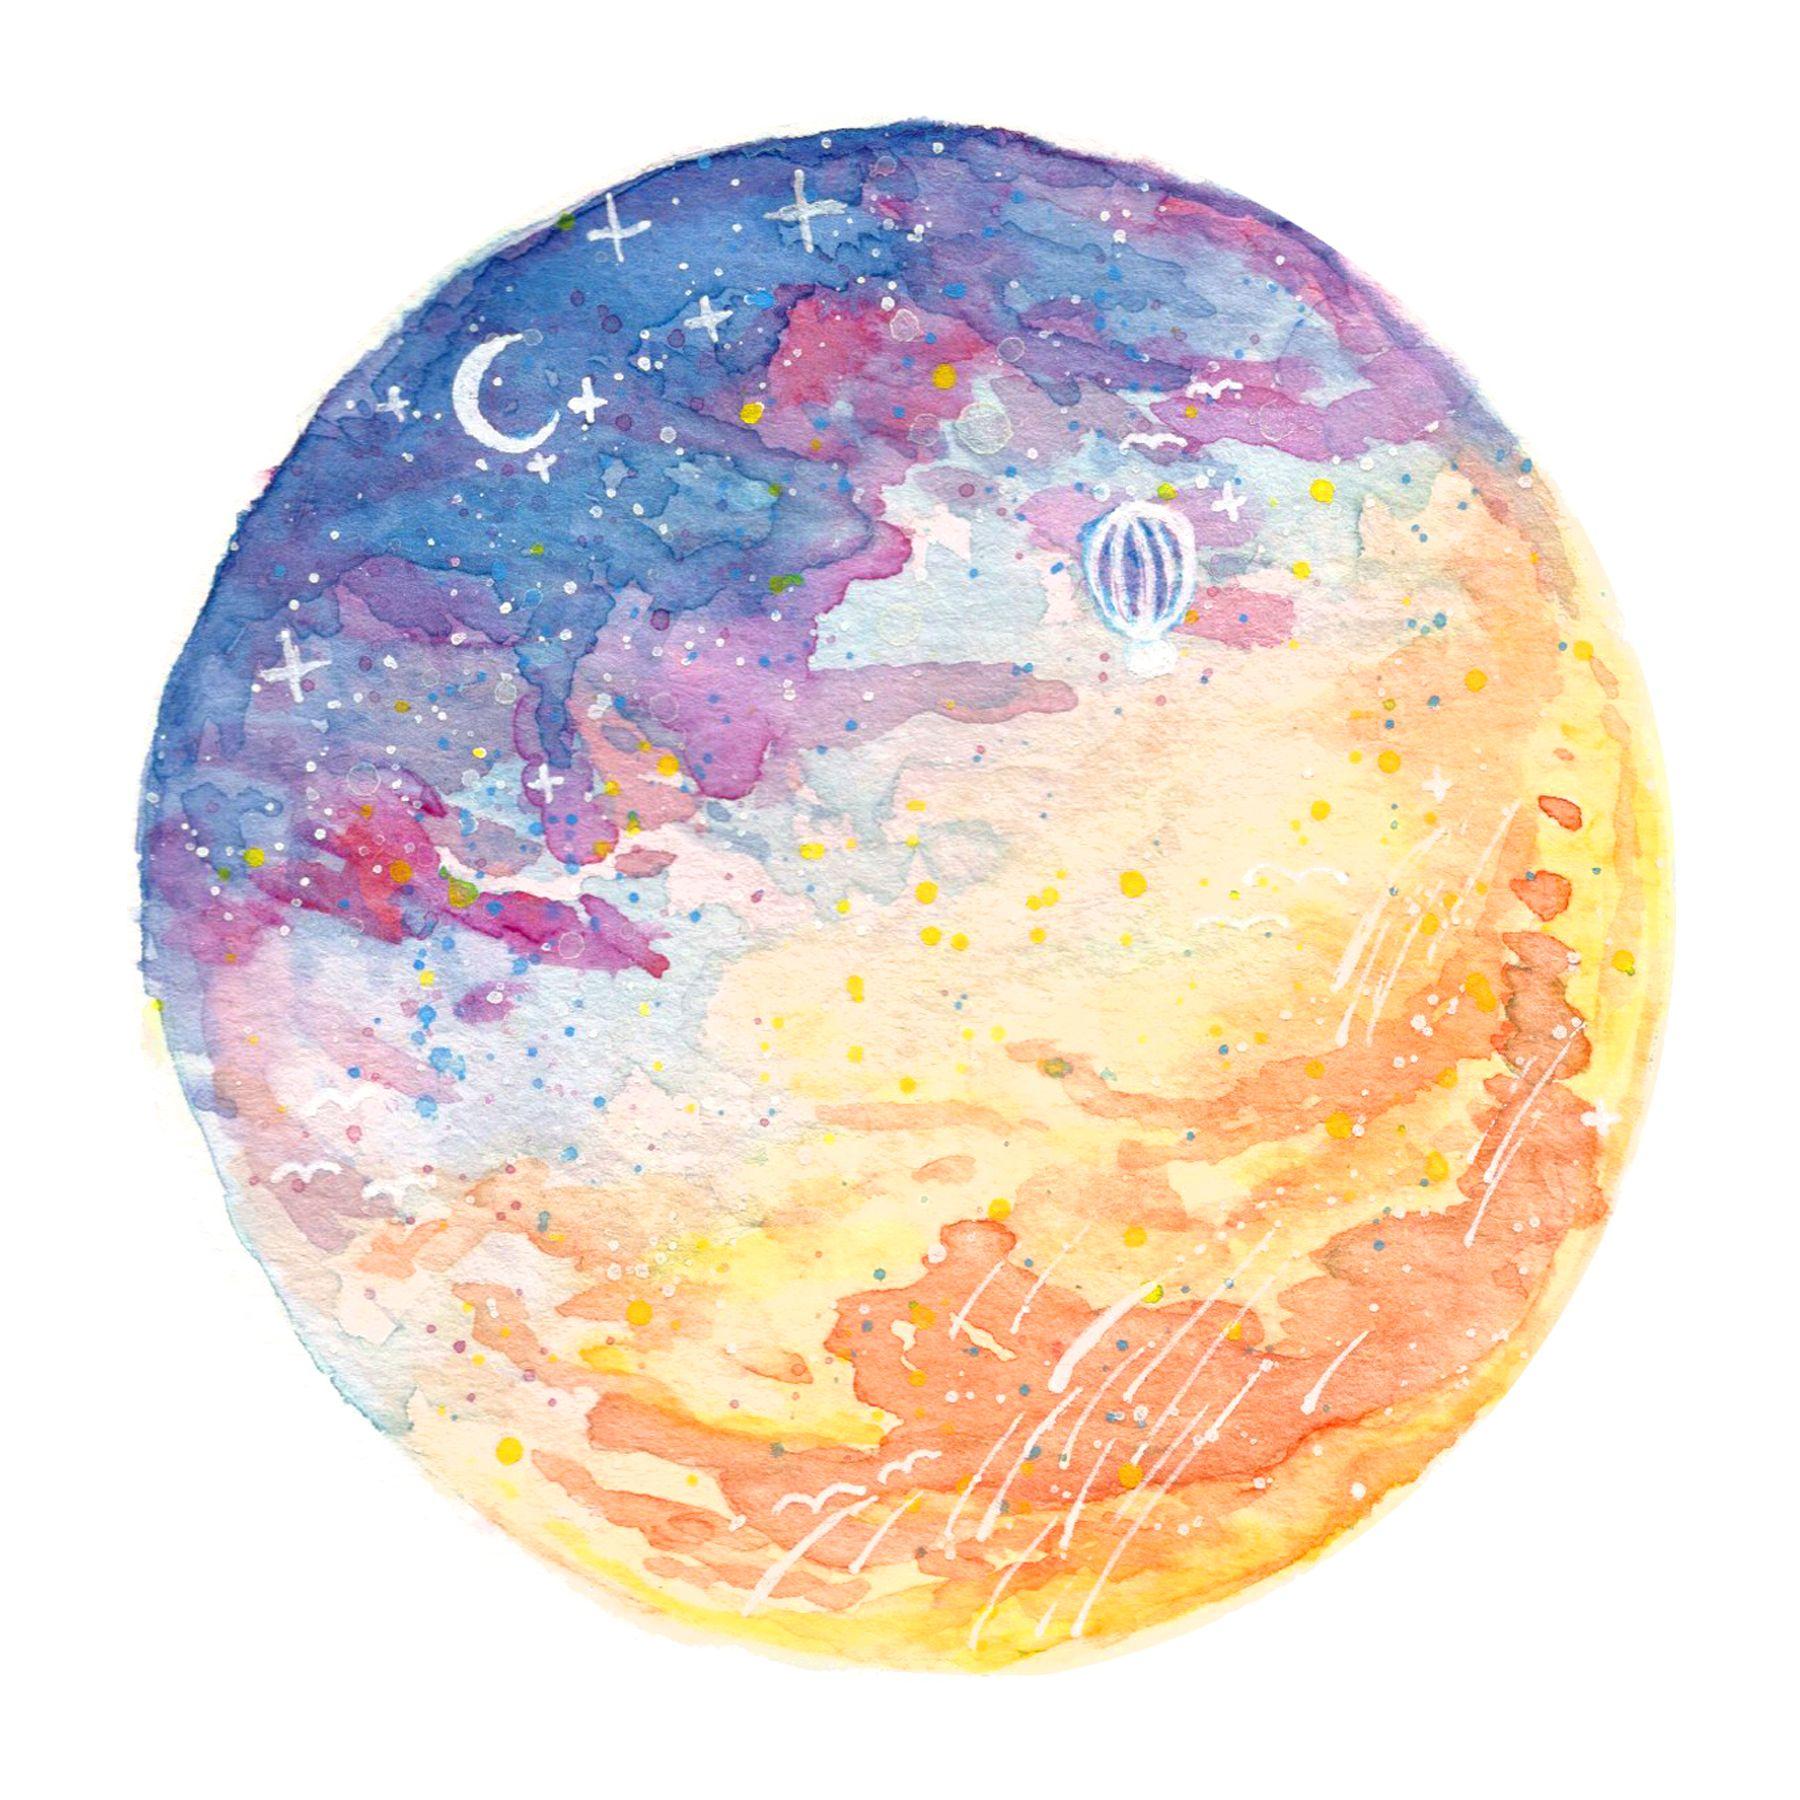 http://www.ebay.com/itm/Beautiful-Watercolor-Sky-Art-Prints-Set-Wall ...